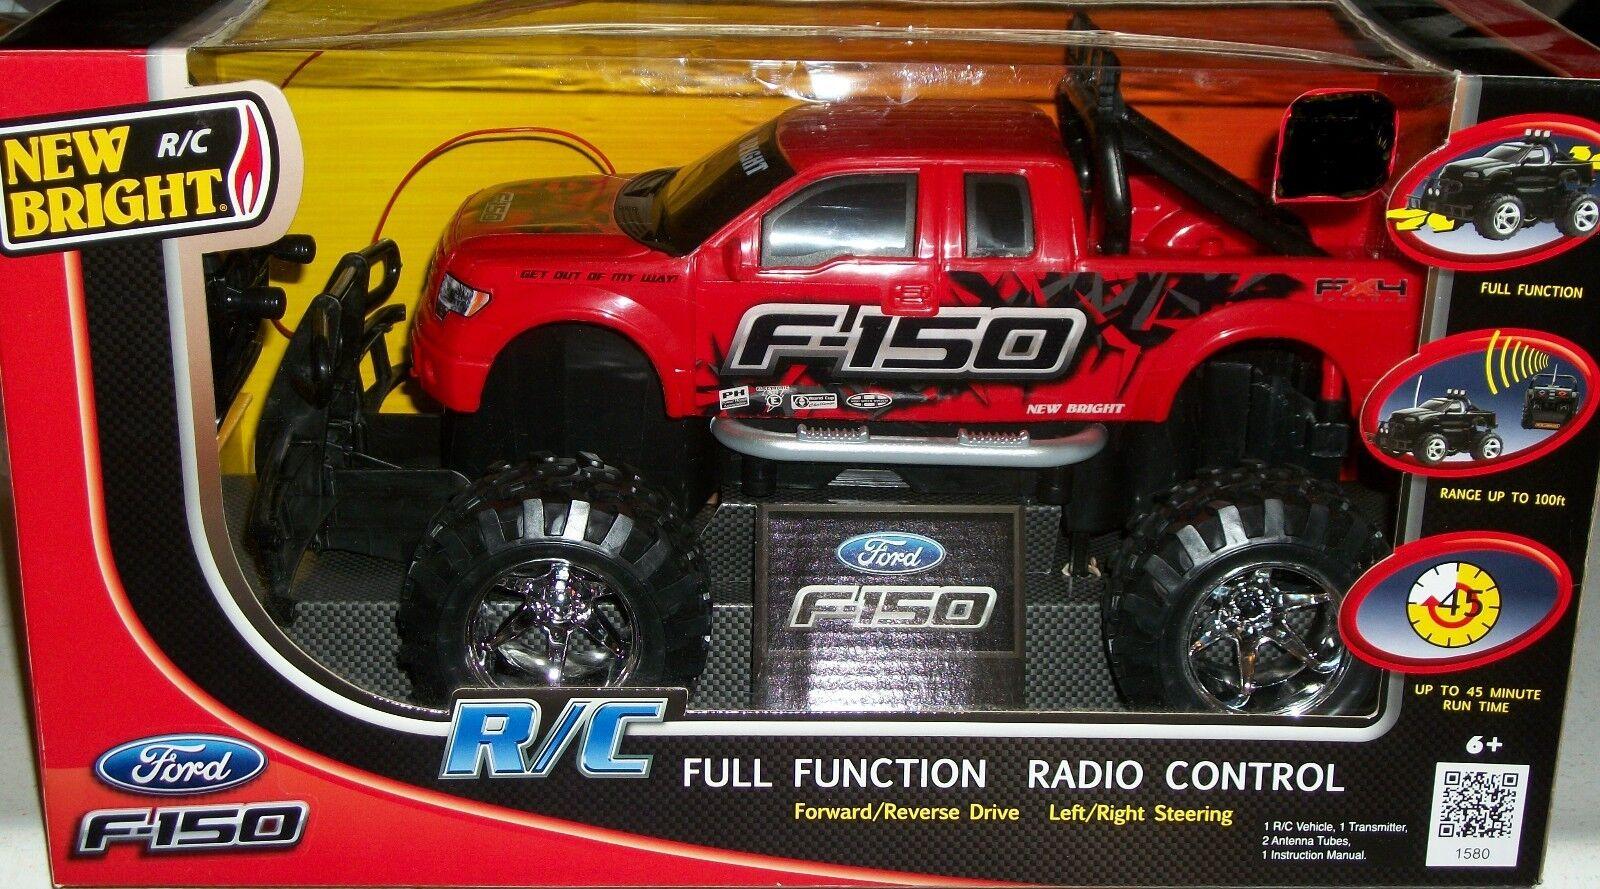 Ford F-150 R C Helfunktionsstyrd radio Pickup Remote leksaksbil Xmas